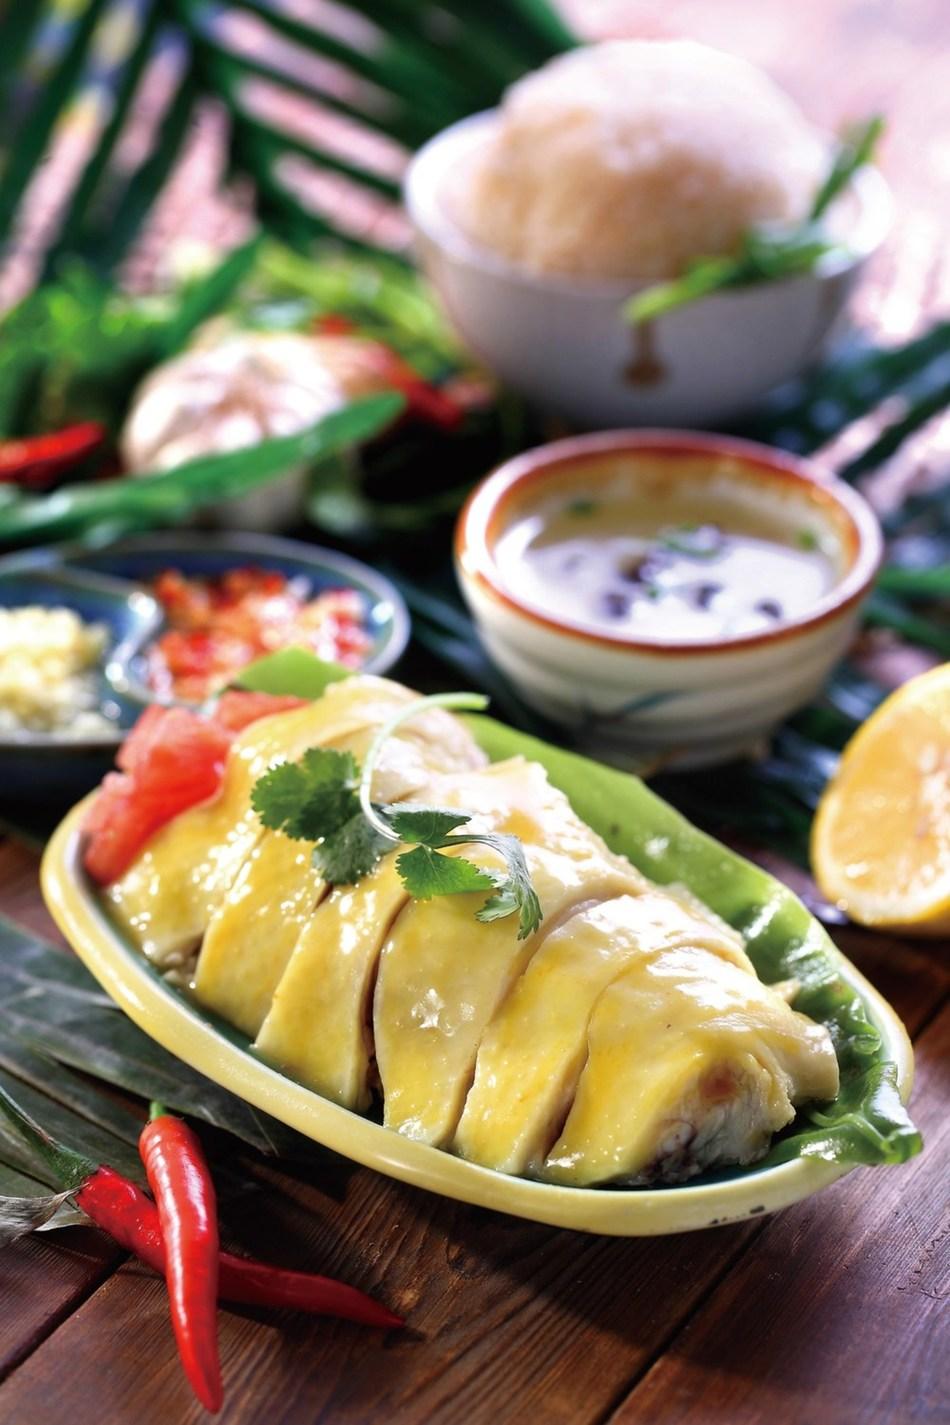 Delicious Cuisine in Haikou